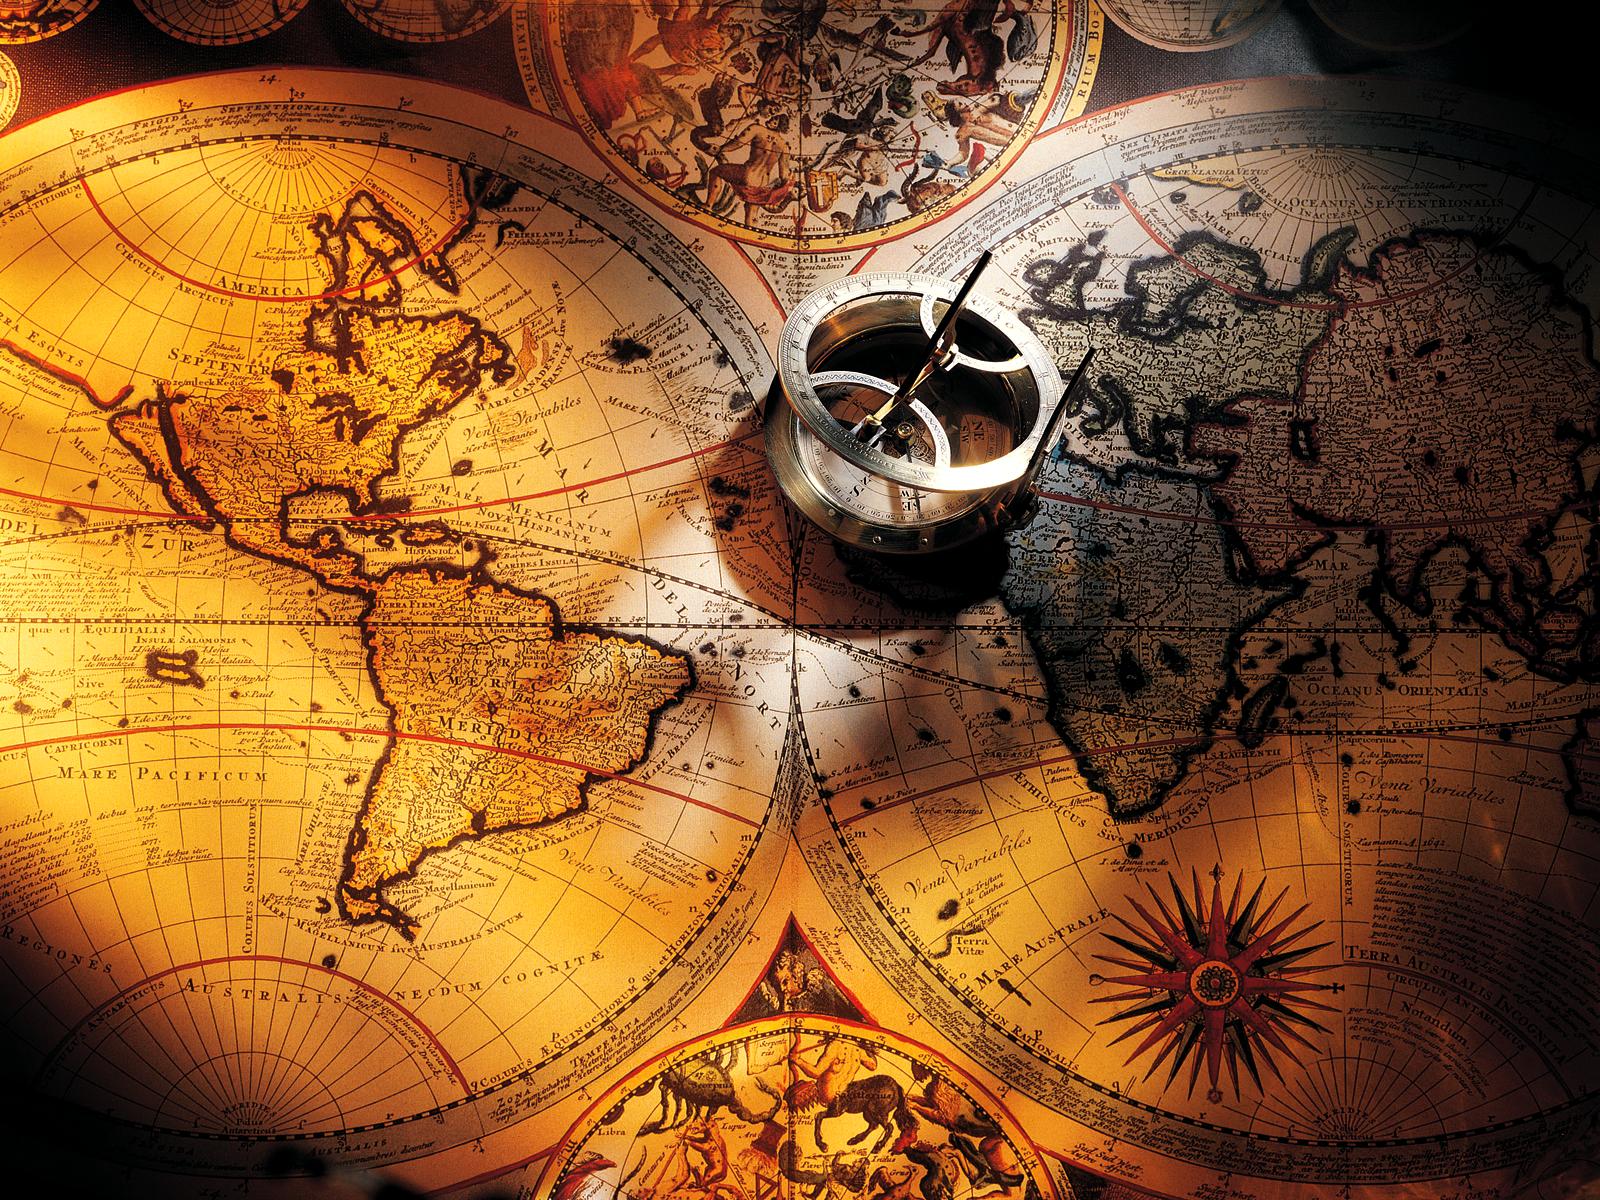 [46+] Antique World Map Wallpaper On WallpaperSafari